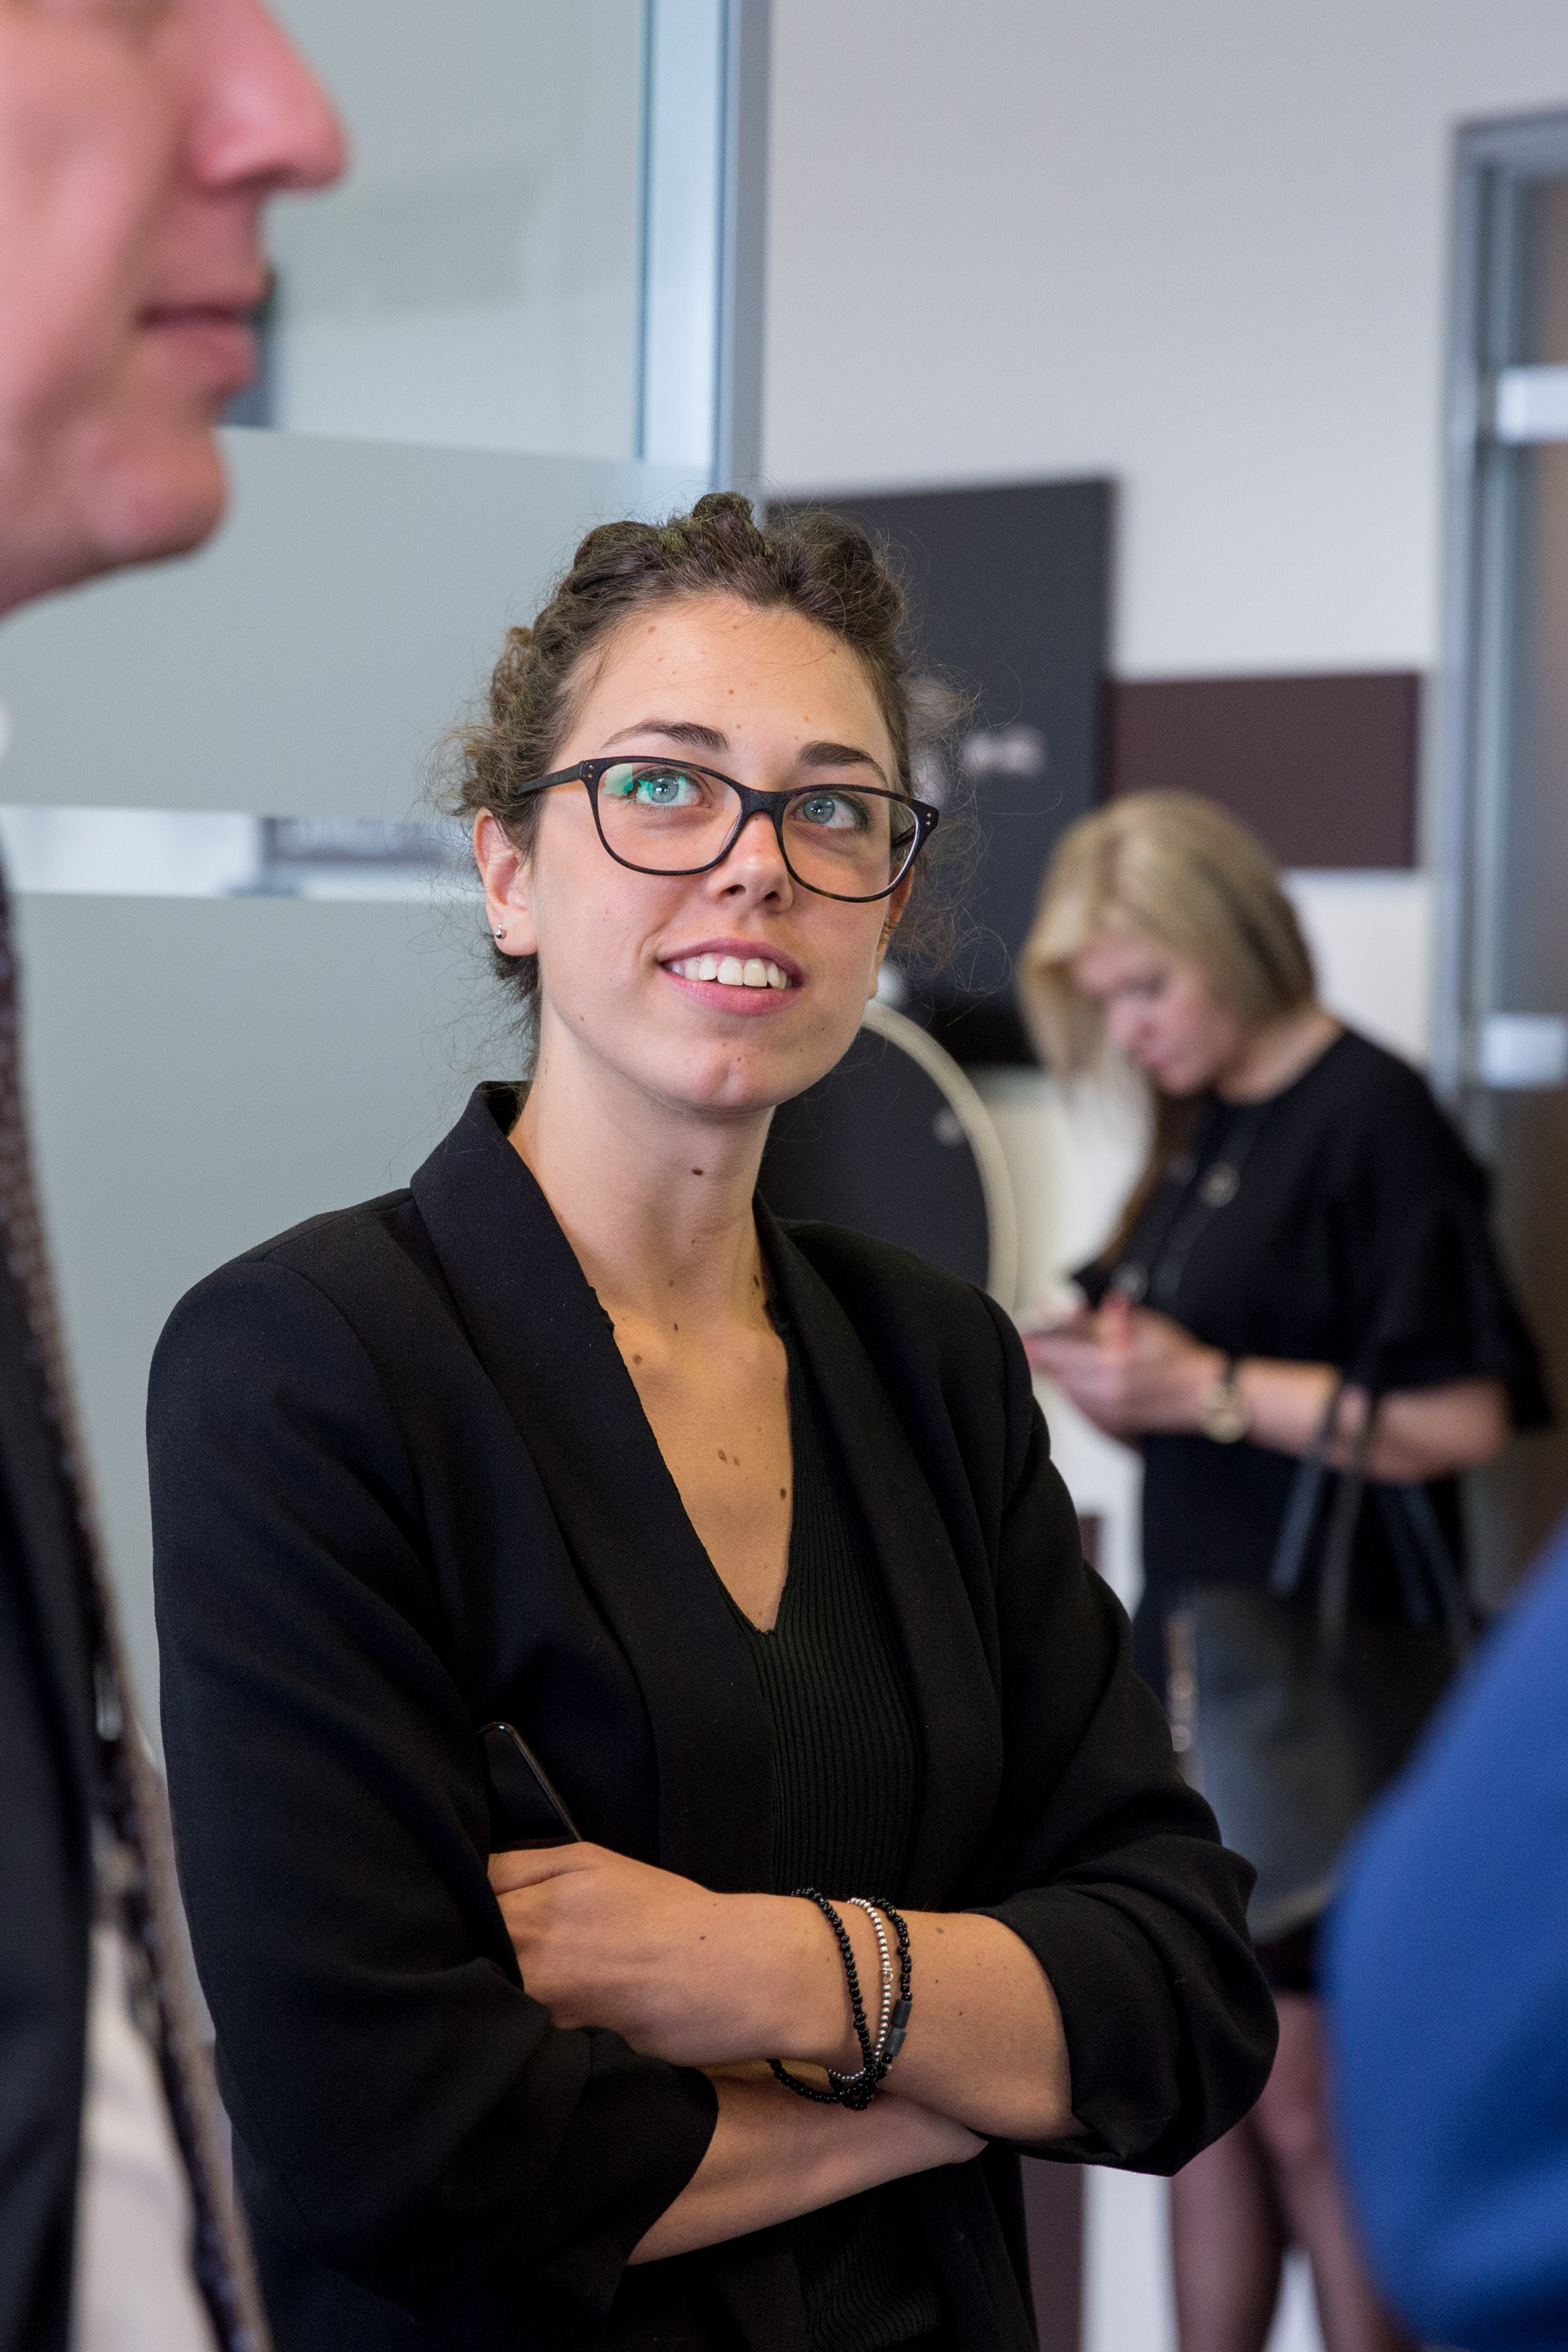 Lavazza kavos ekspertė Giulia Sirio